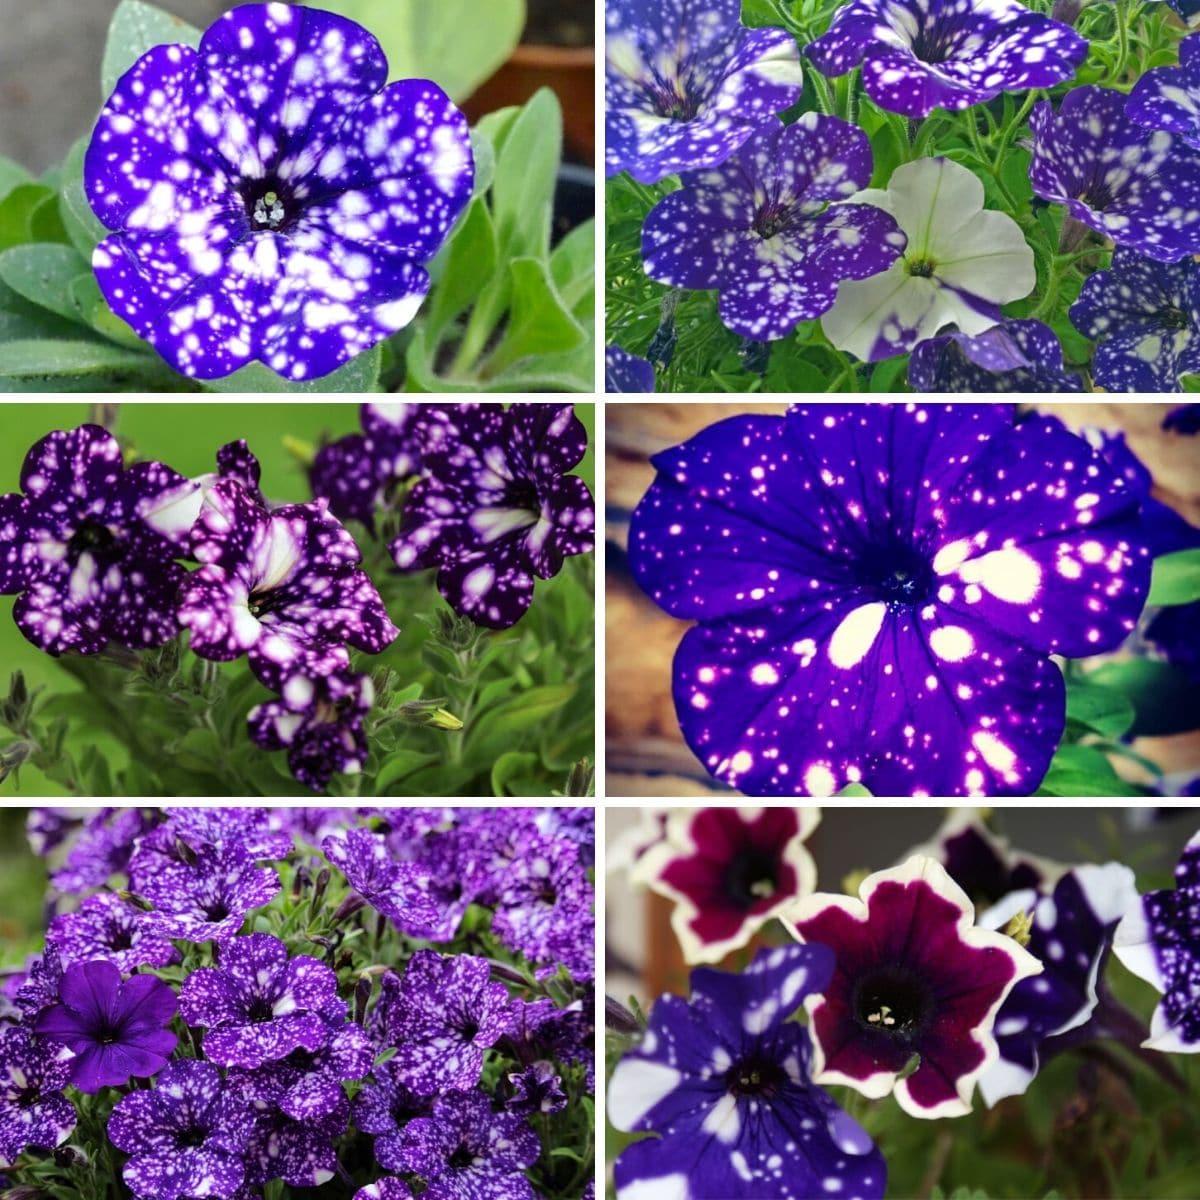 Collage photo featuring close up night sky petunias.